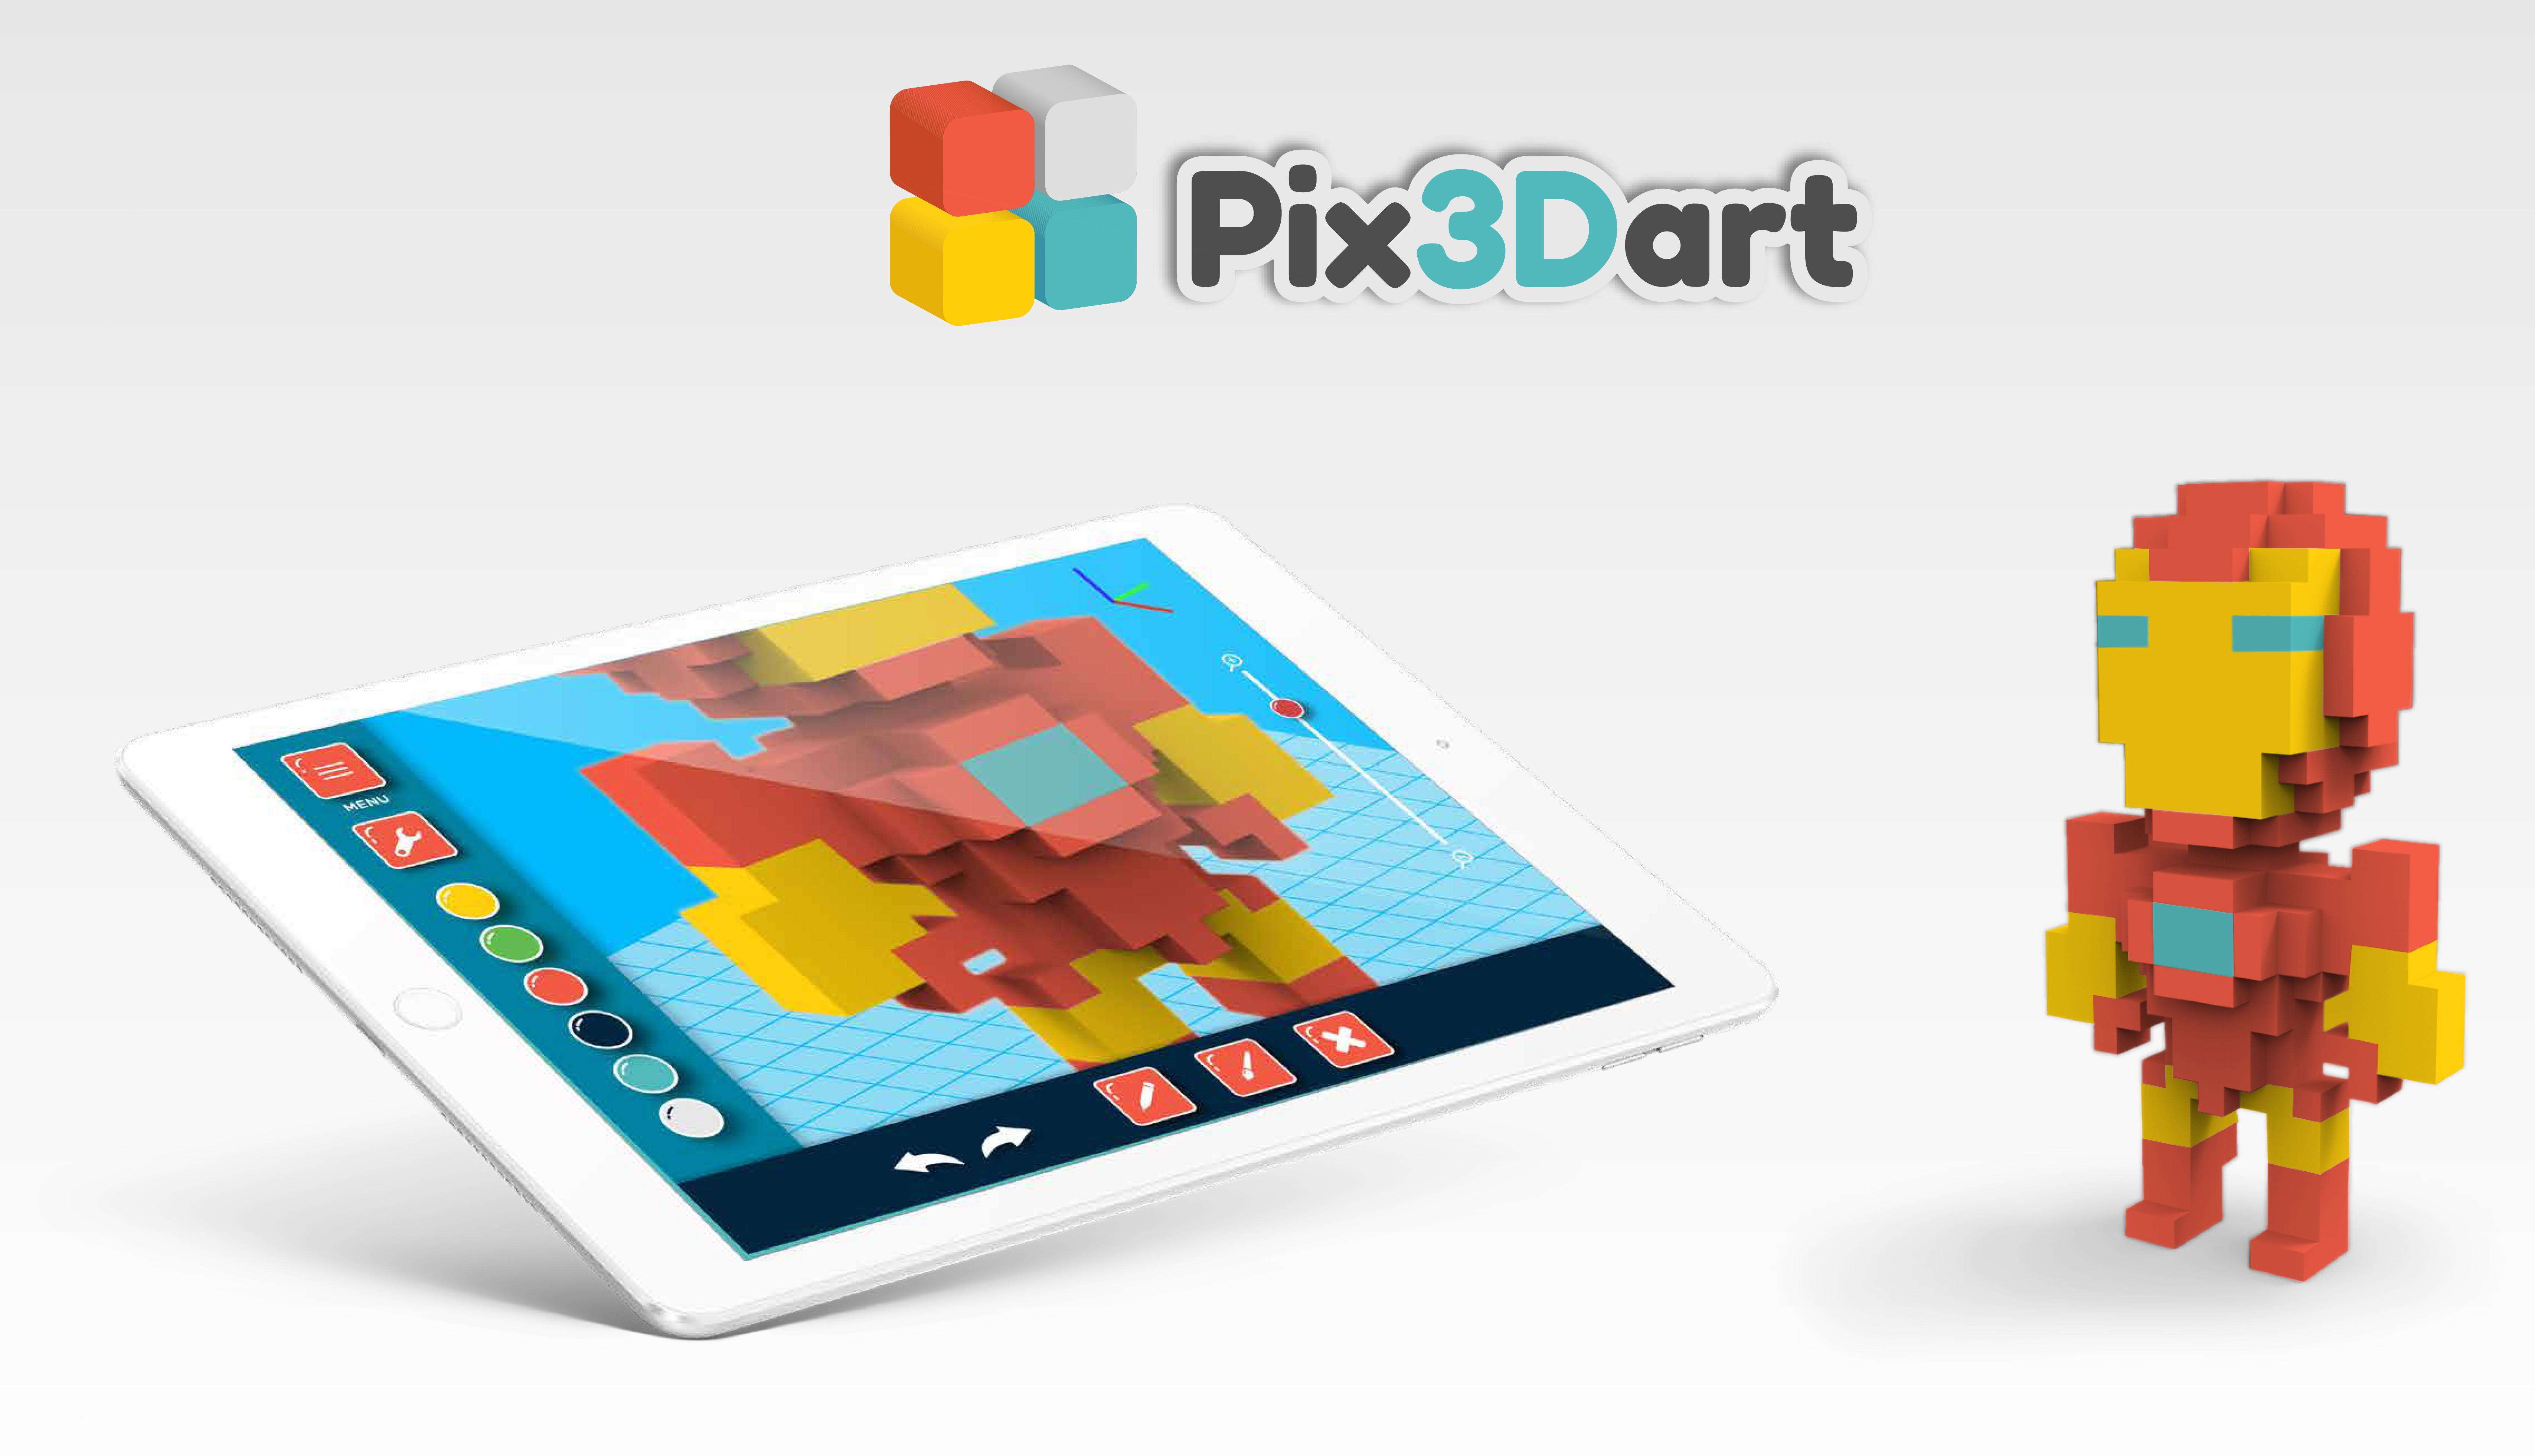 Pix3Dart